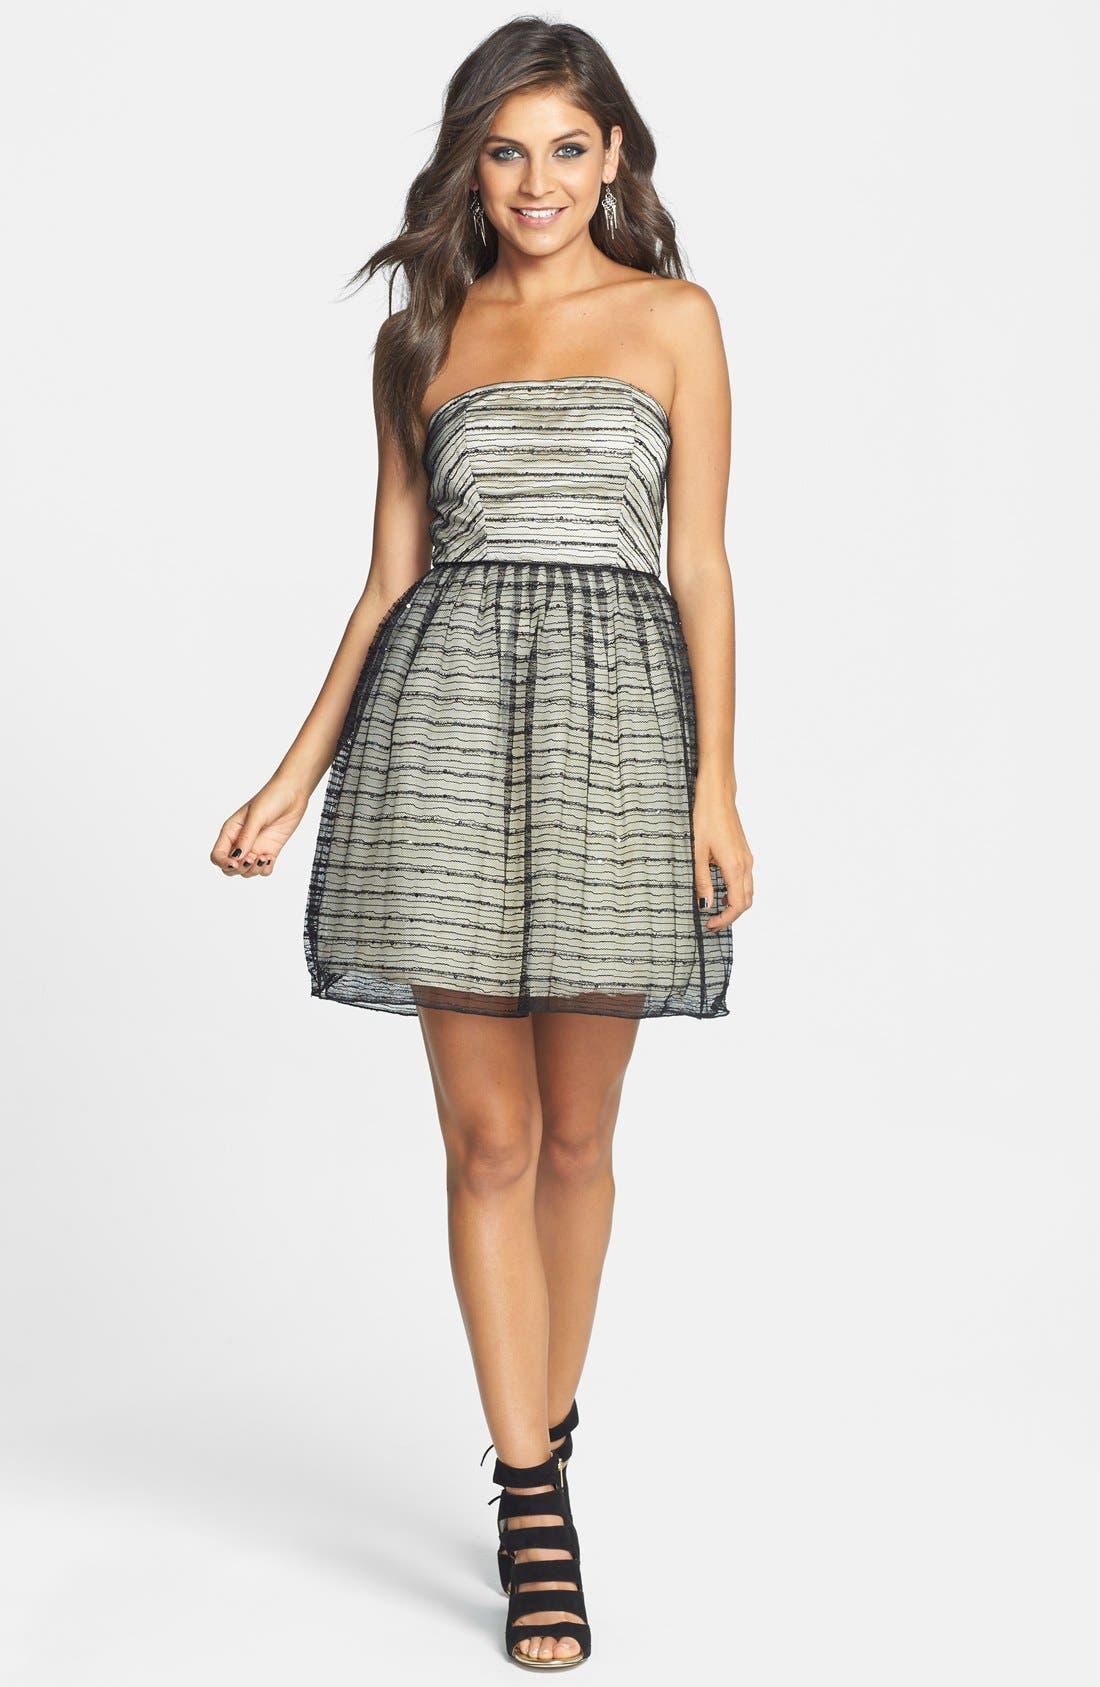 Alternate Image 1 Selected - a. drea Glitter Textured Fit & Flare Dress (Juniors)